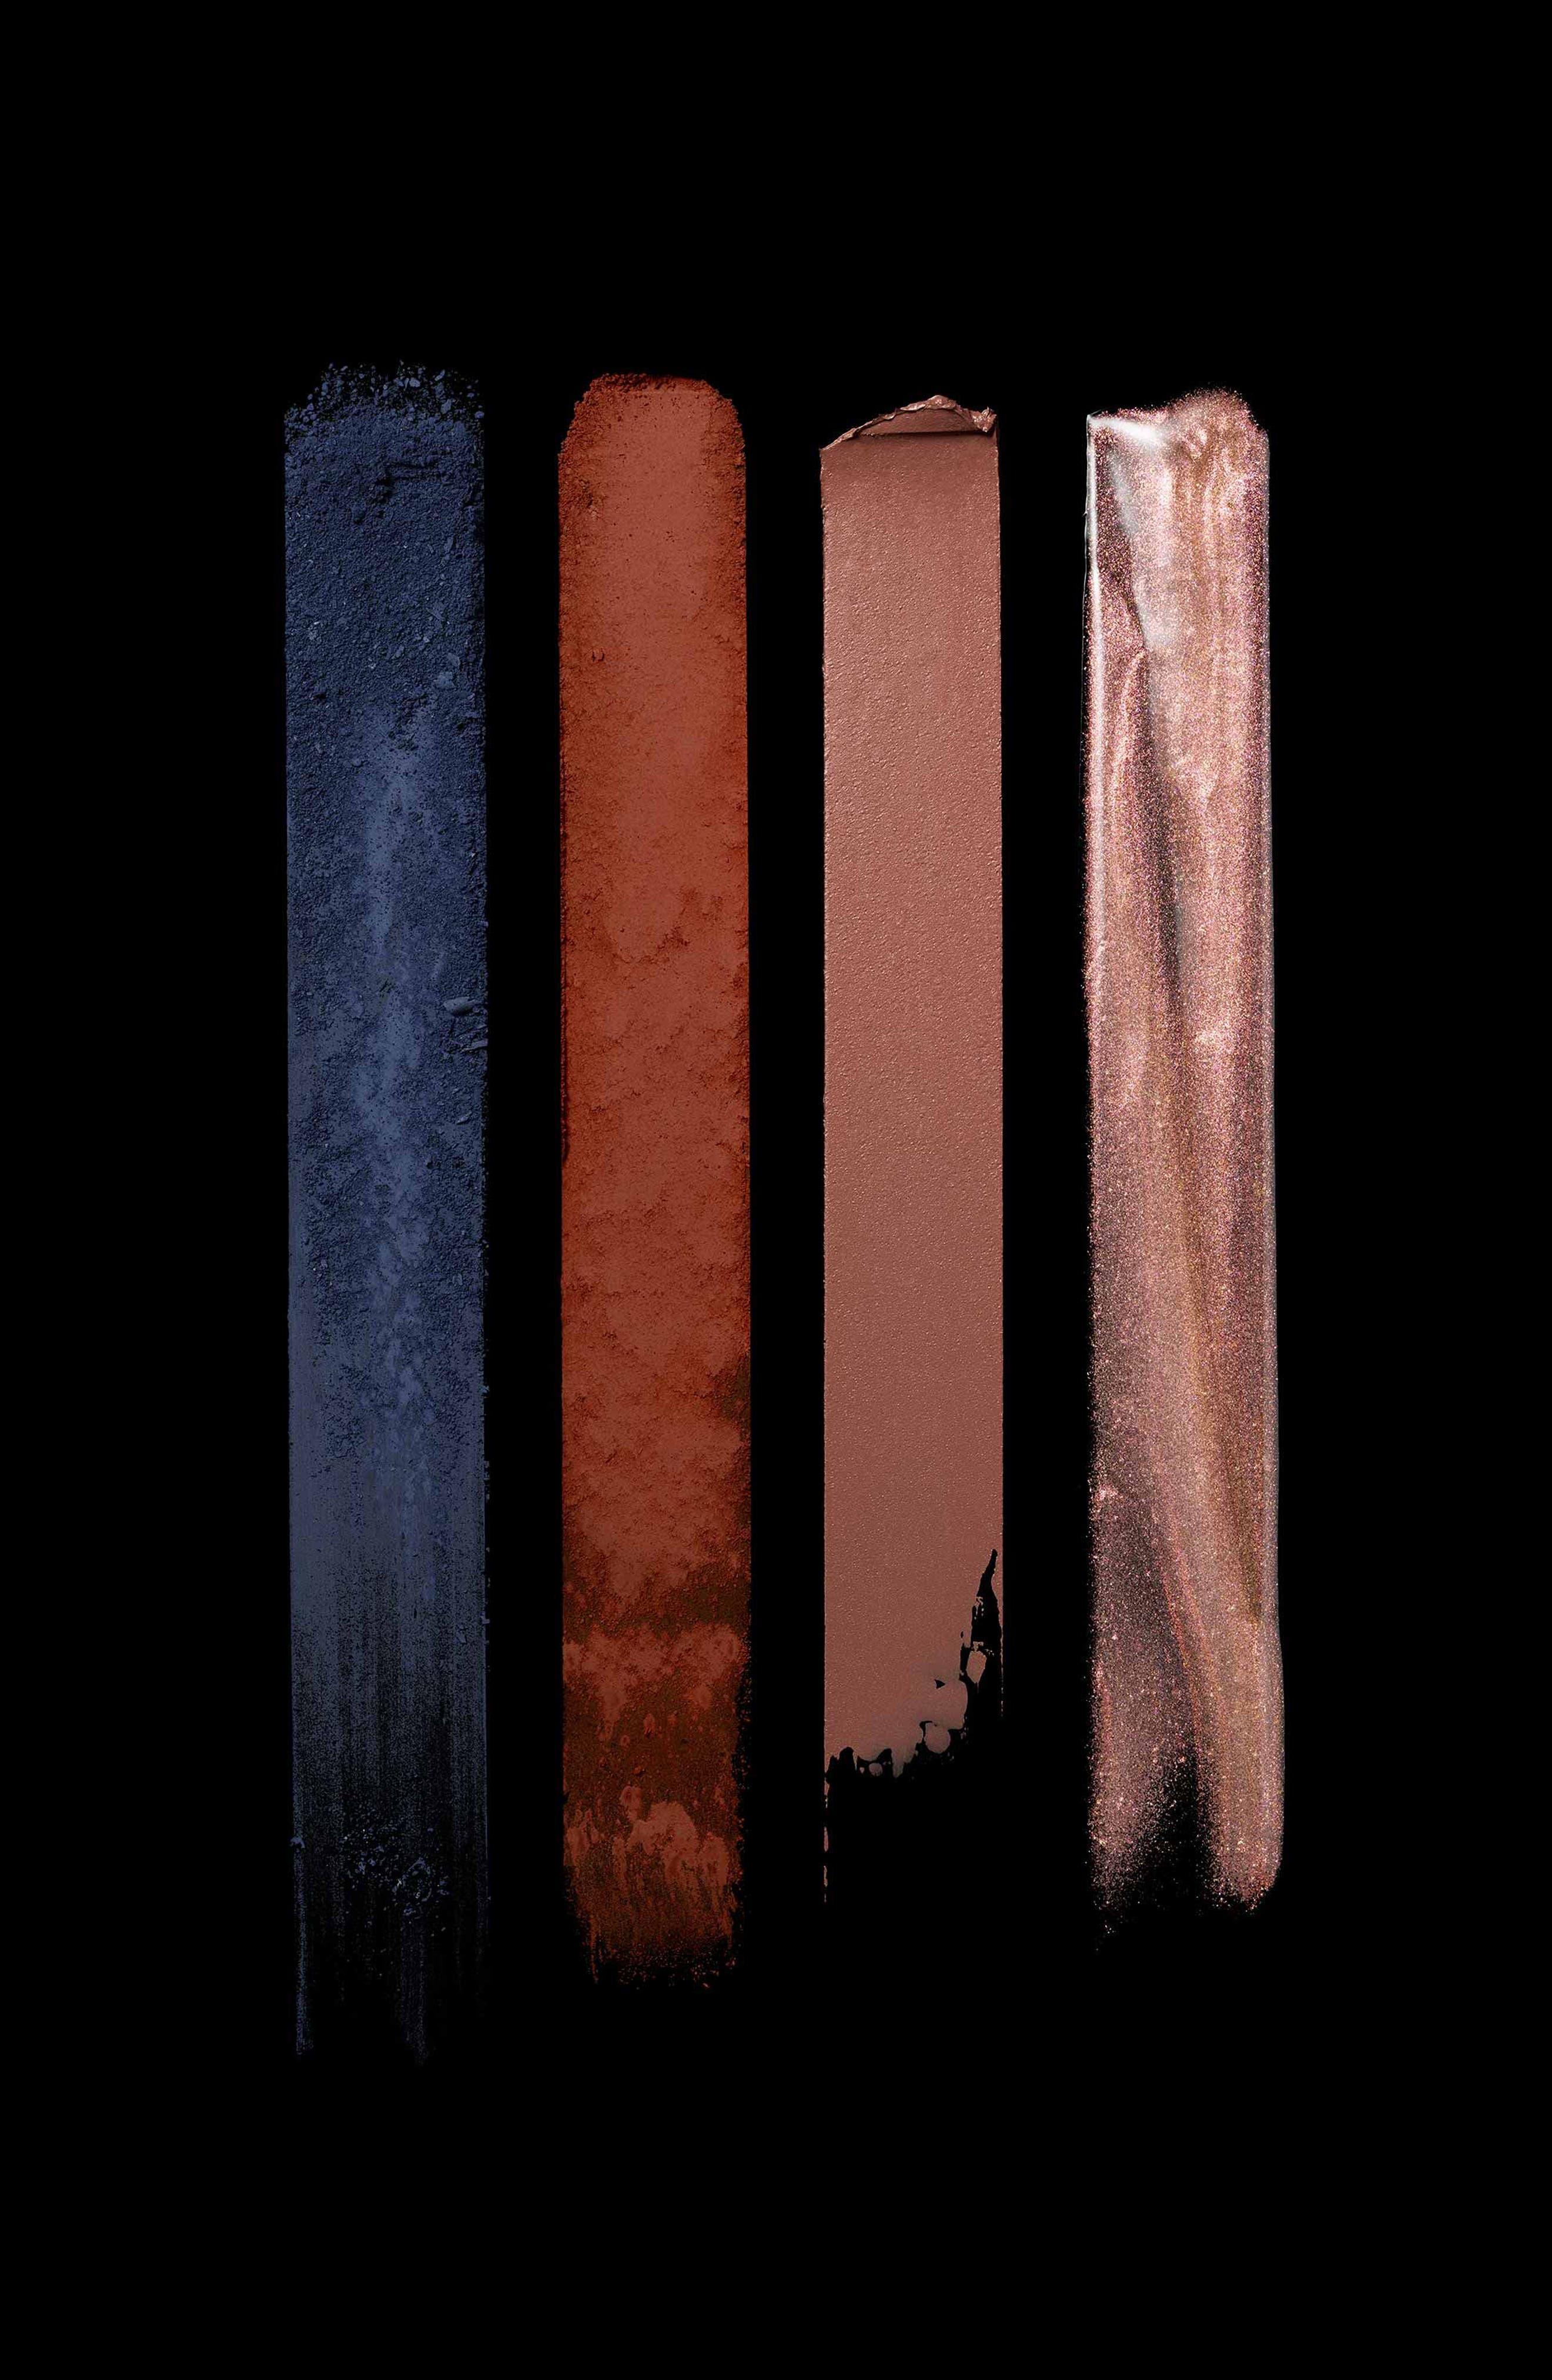 Victoria Beckham Eye Kajal,                             Alternate thumbnail 13, color,                             Black Saffron/ Vanille